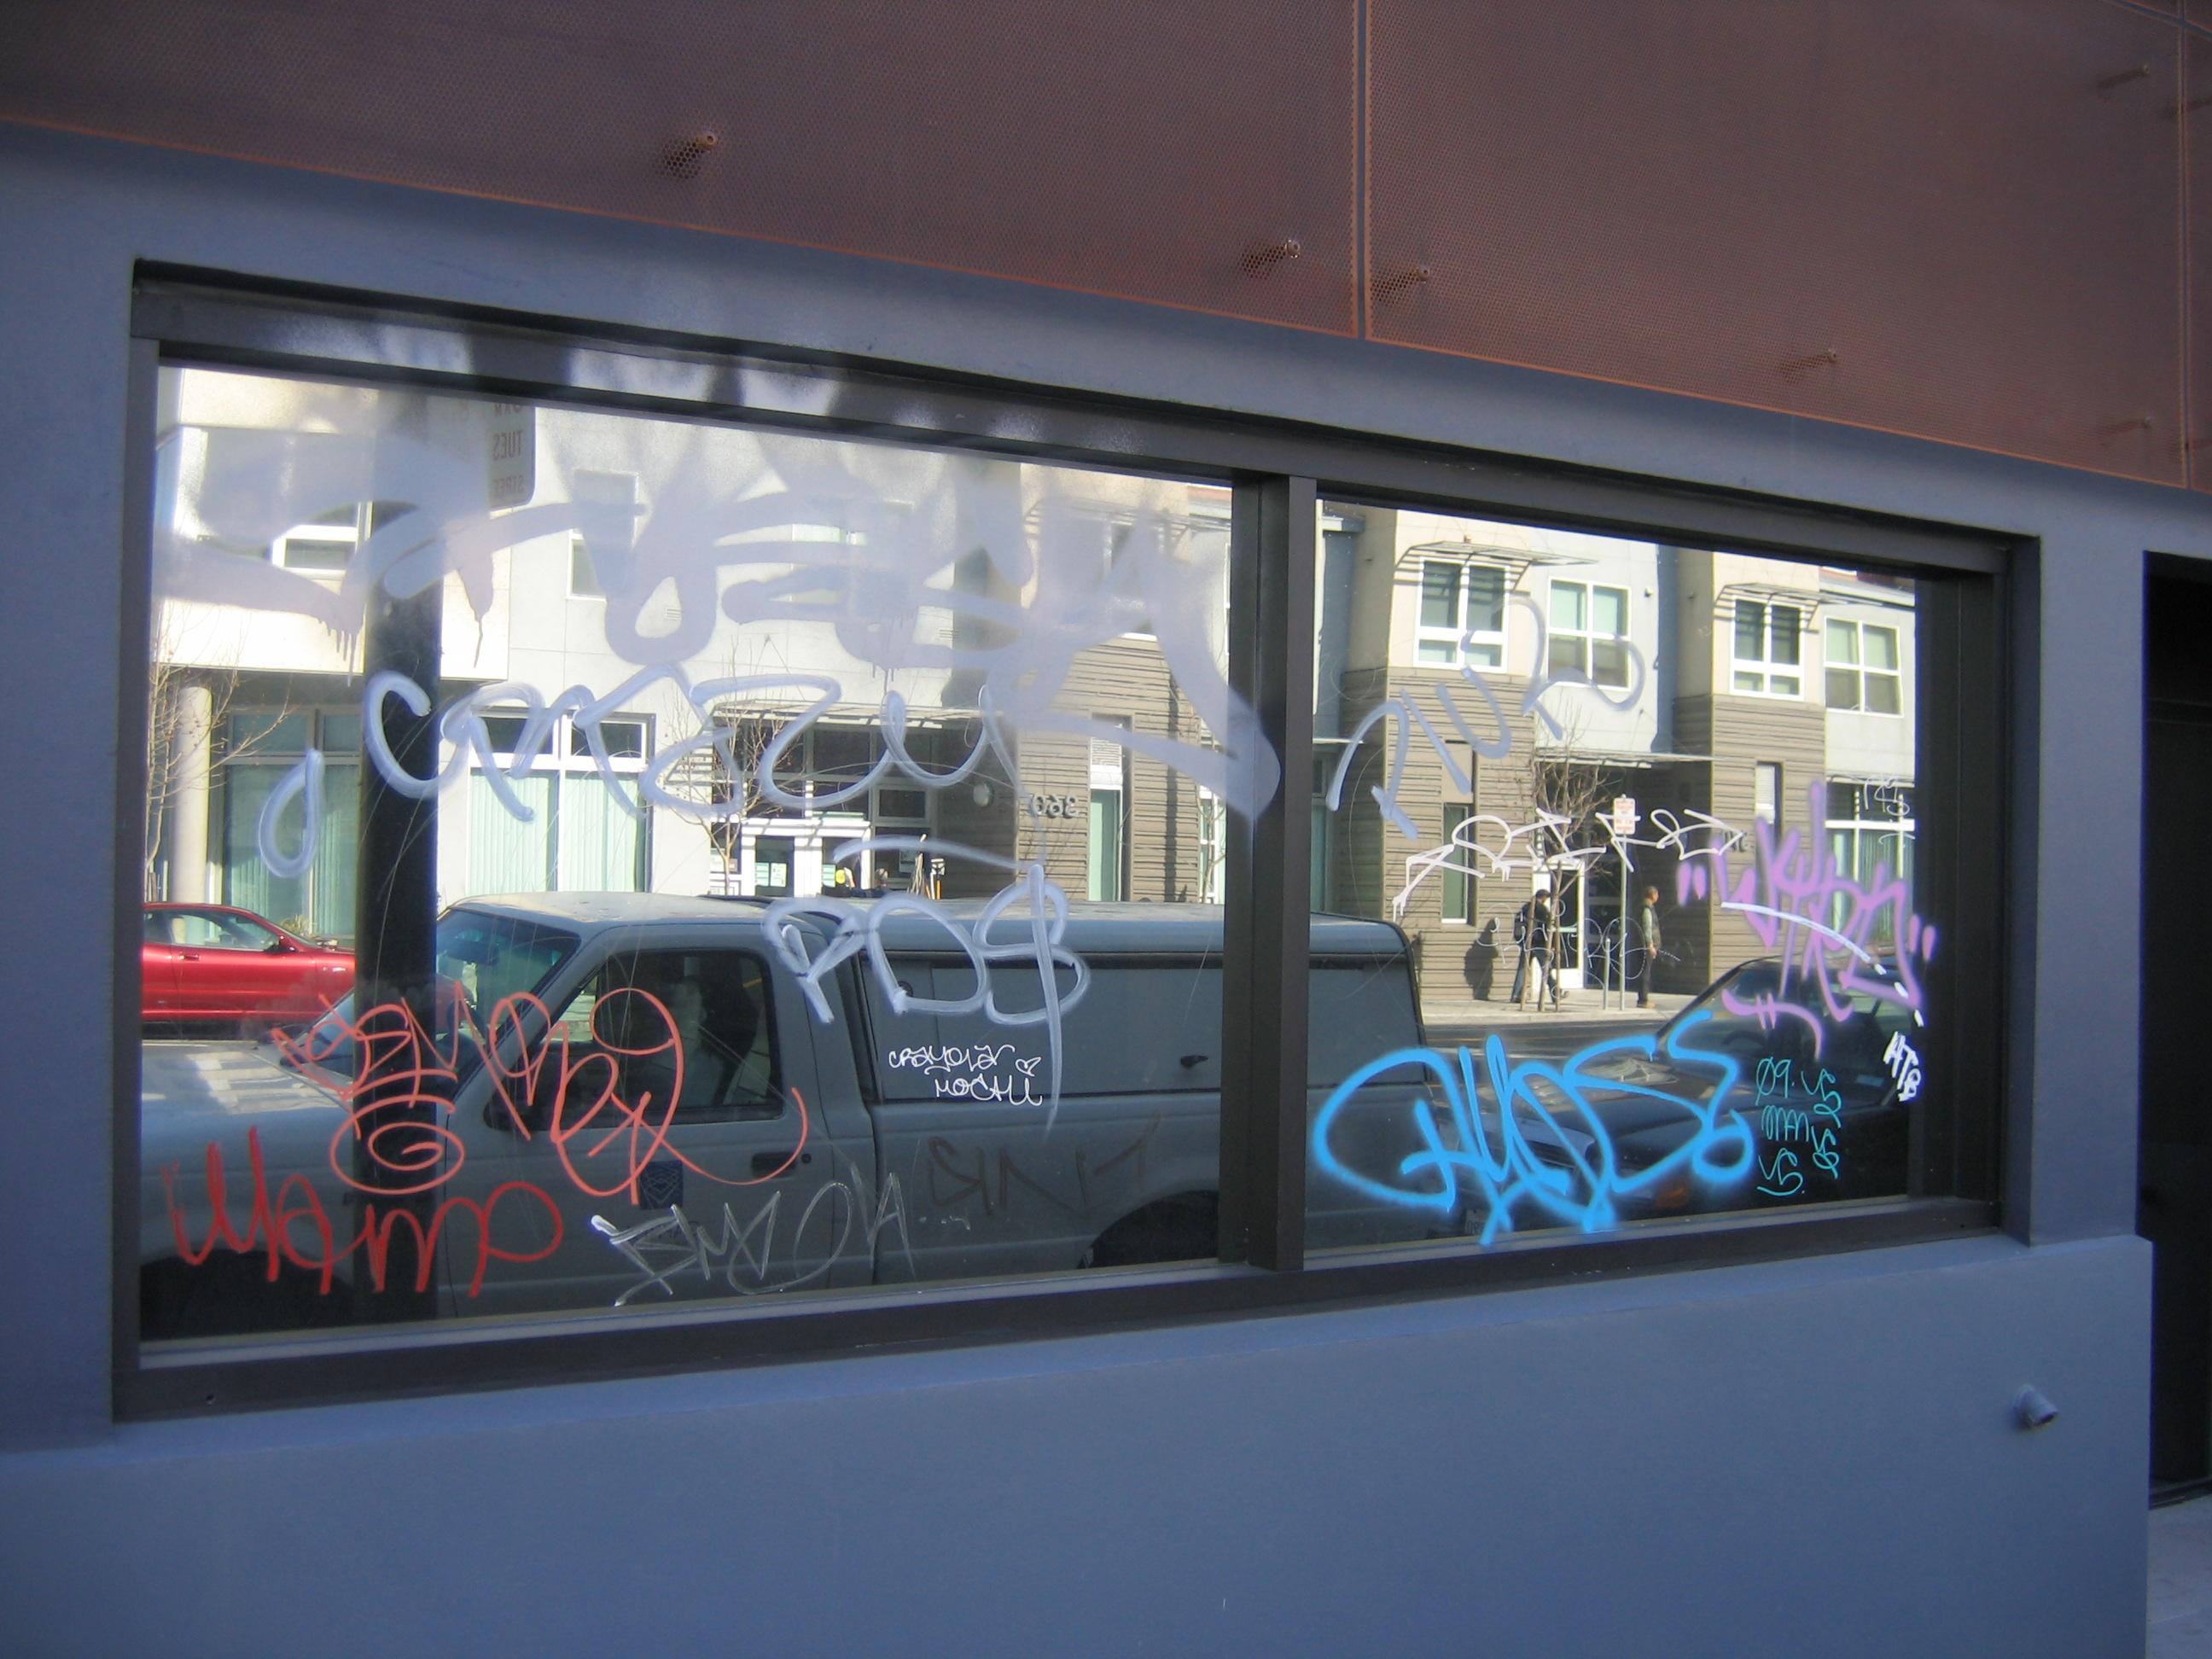 vandal-film-window-tinting-sydney-shopfront